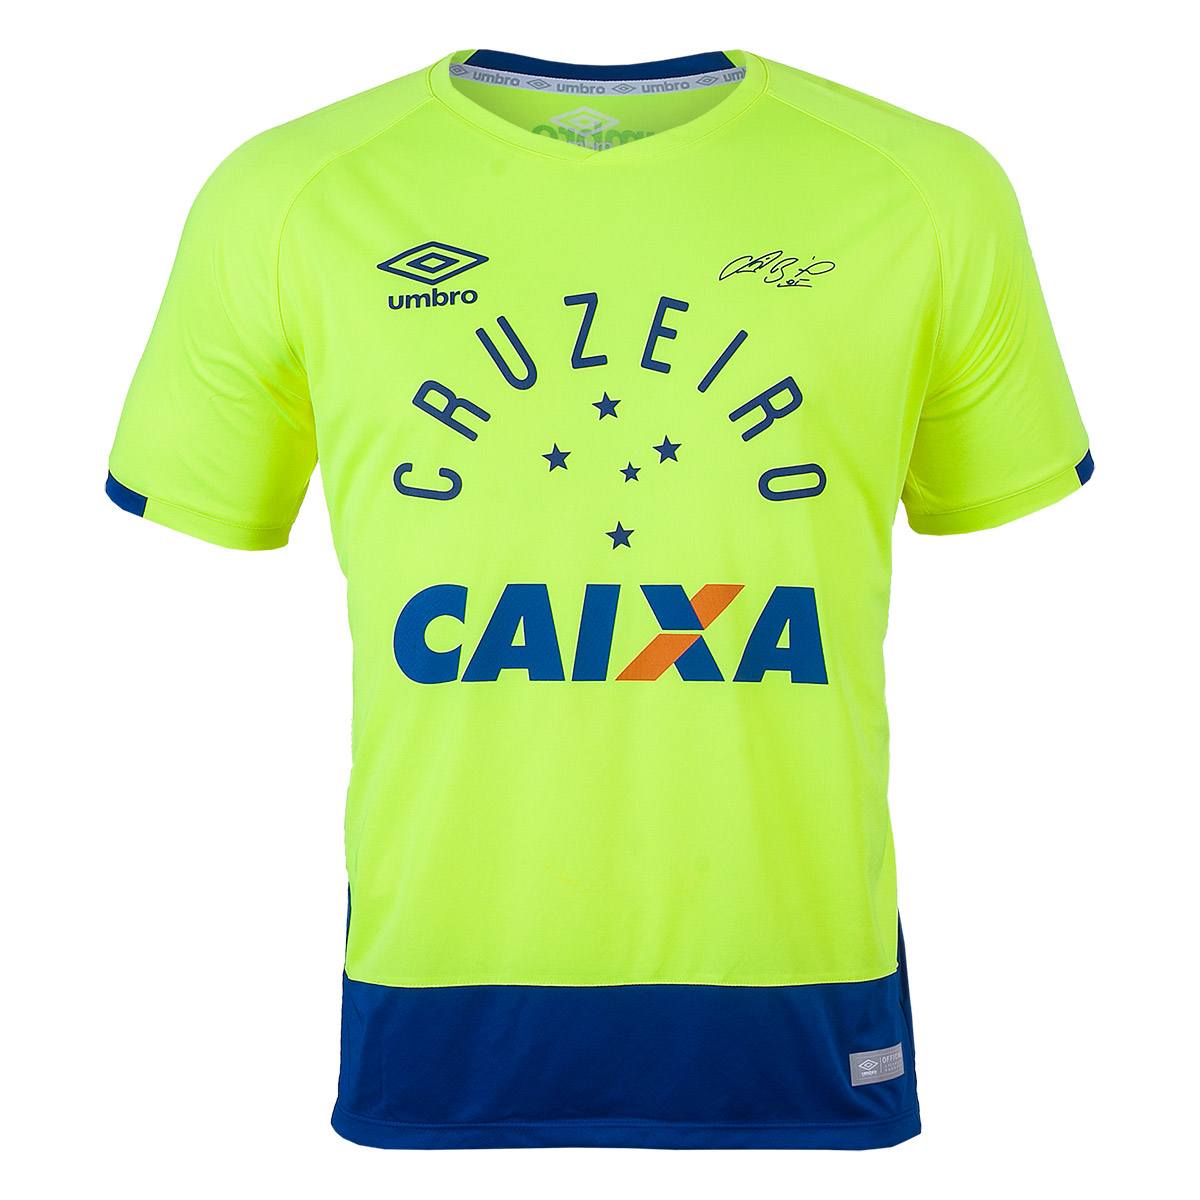 Camisa Masc. Umbro Gole. Cruzeiro 2016 - Verde Vibrante